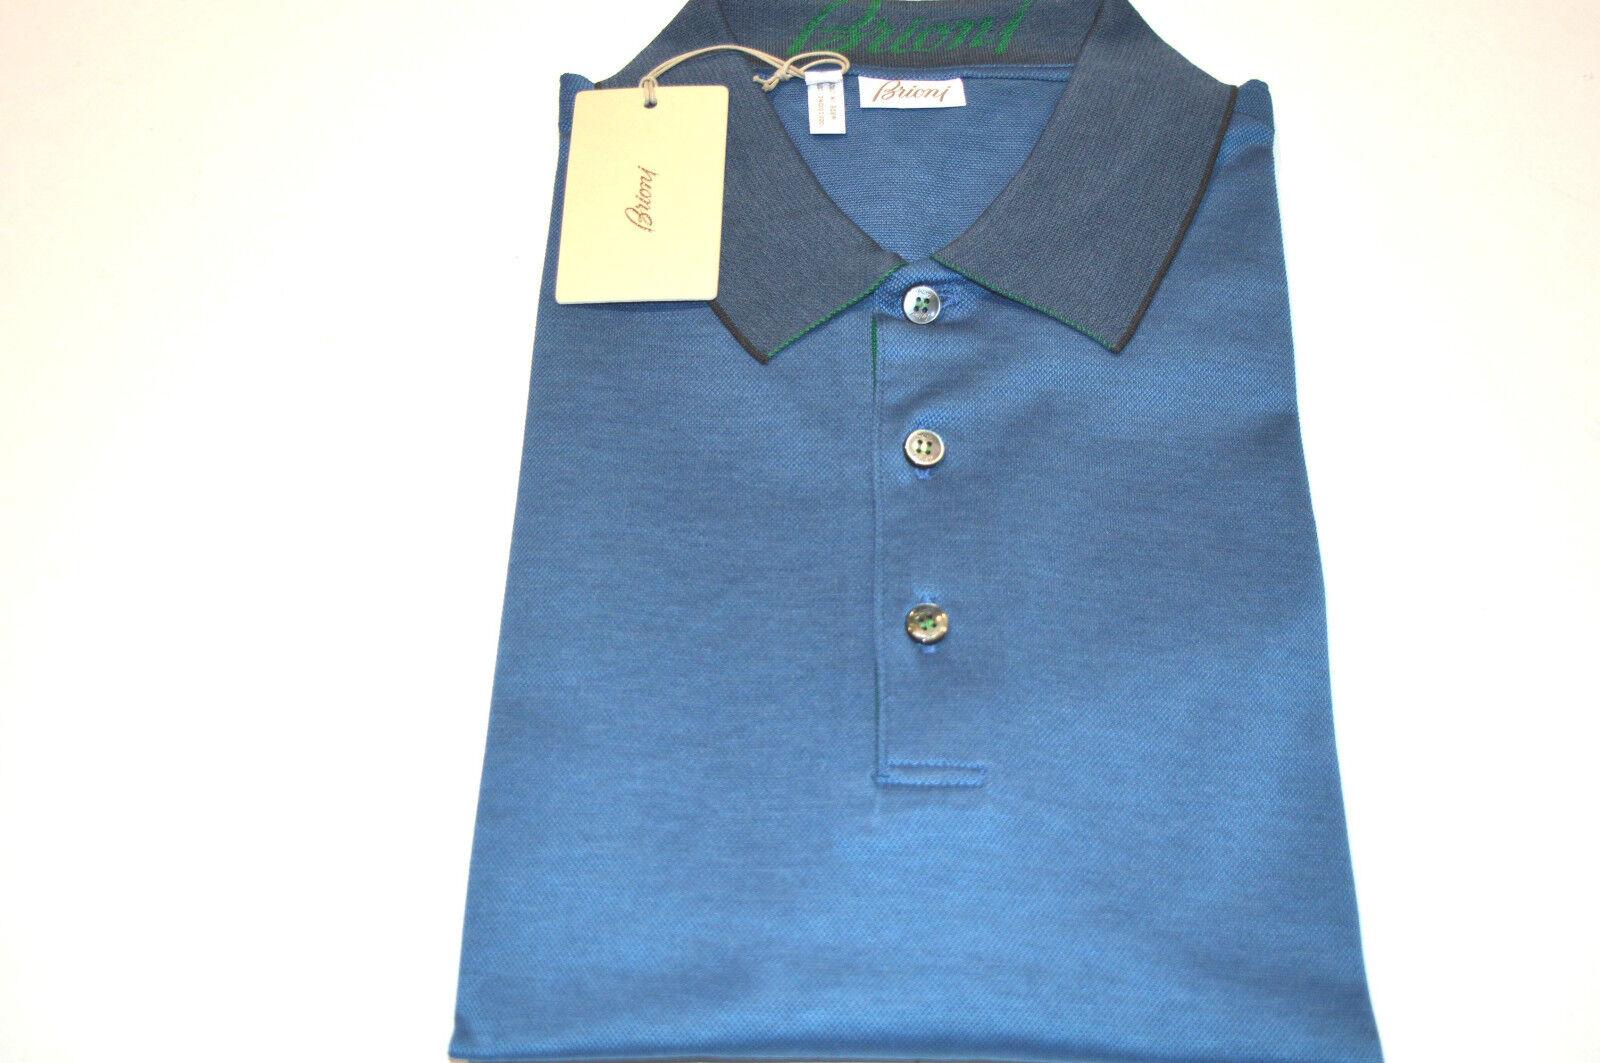 NEW  BRIONI Polo  Short Sleeve baumwolle Größe L Us Eu 52 (Tubic1))